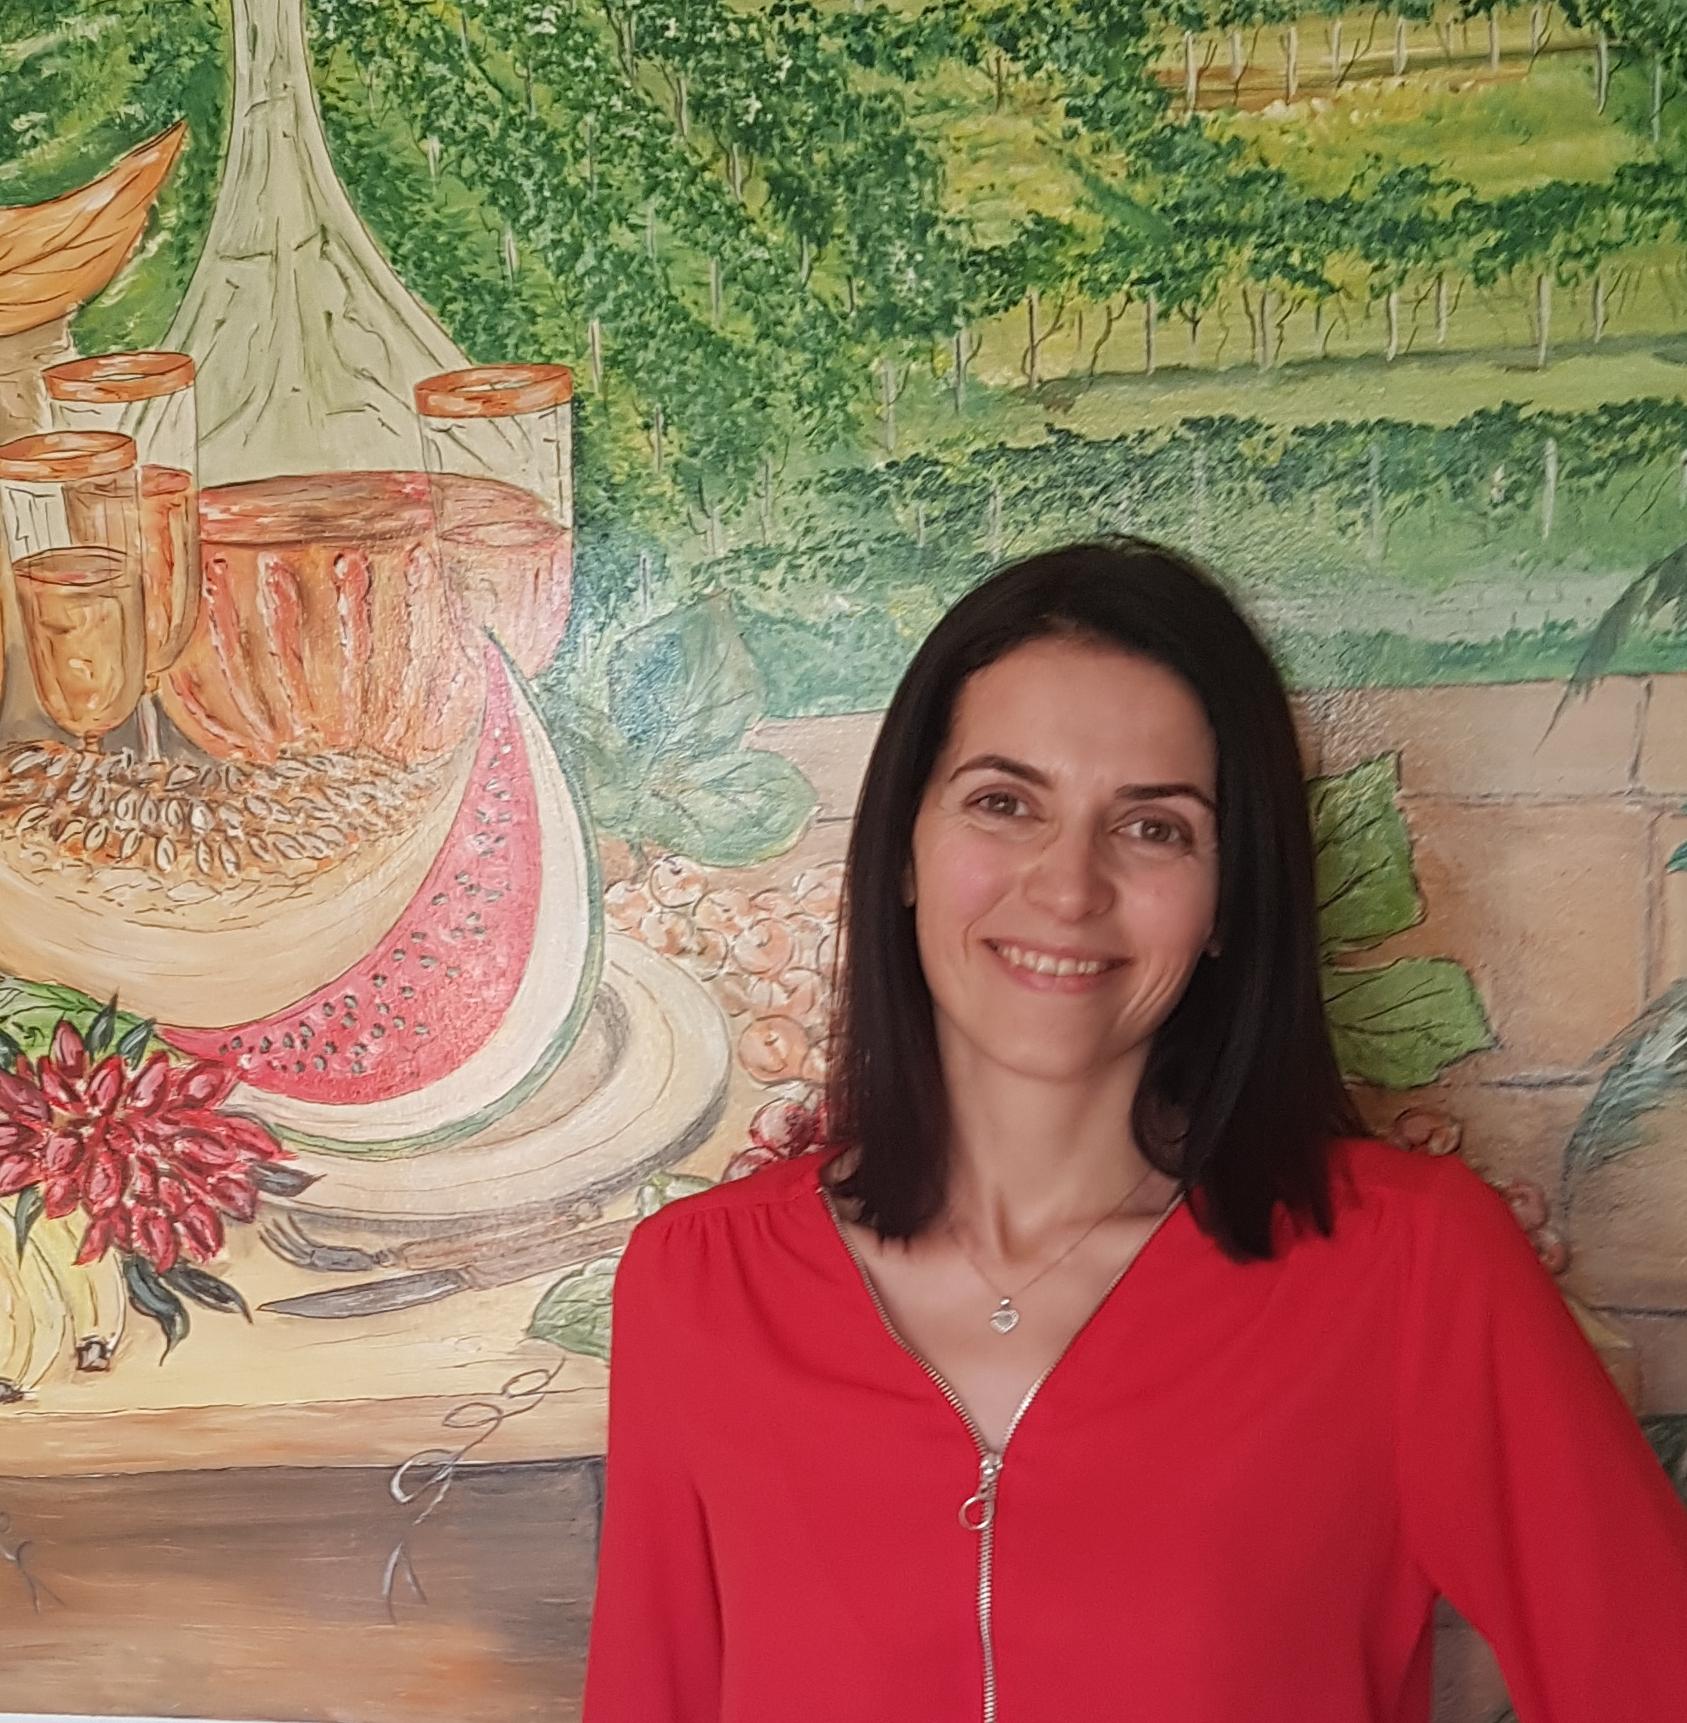 Susana Gomes Ferreira